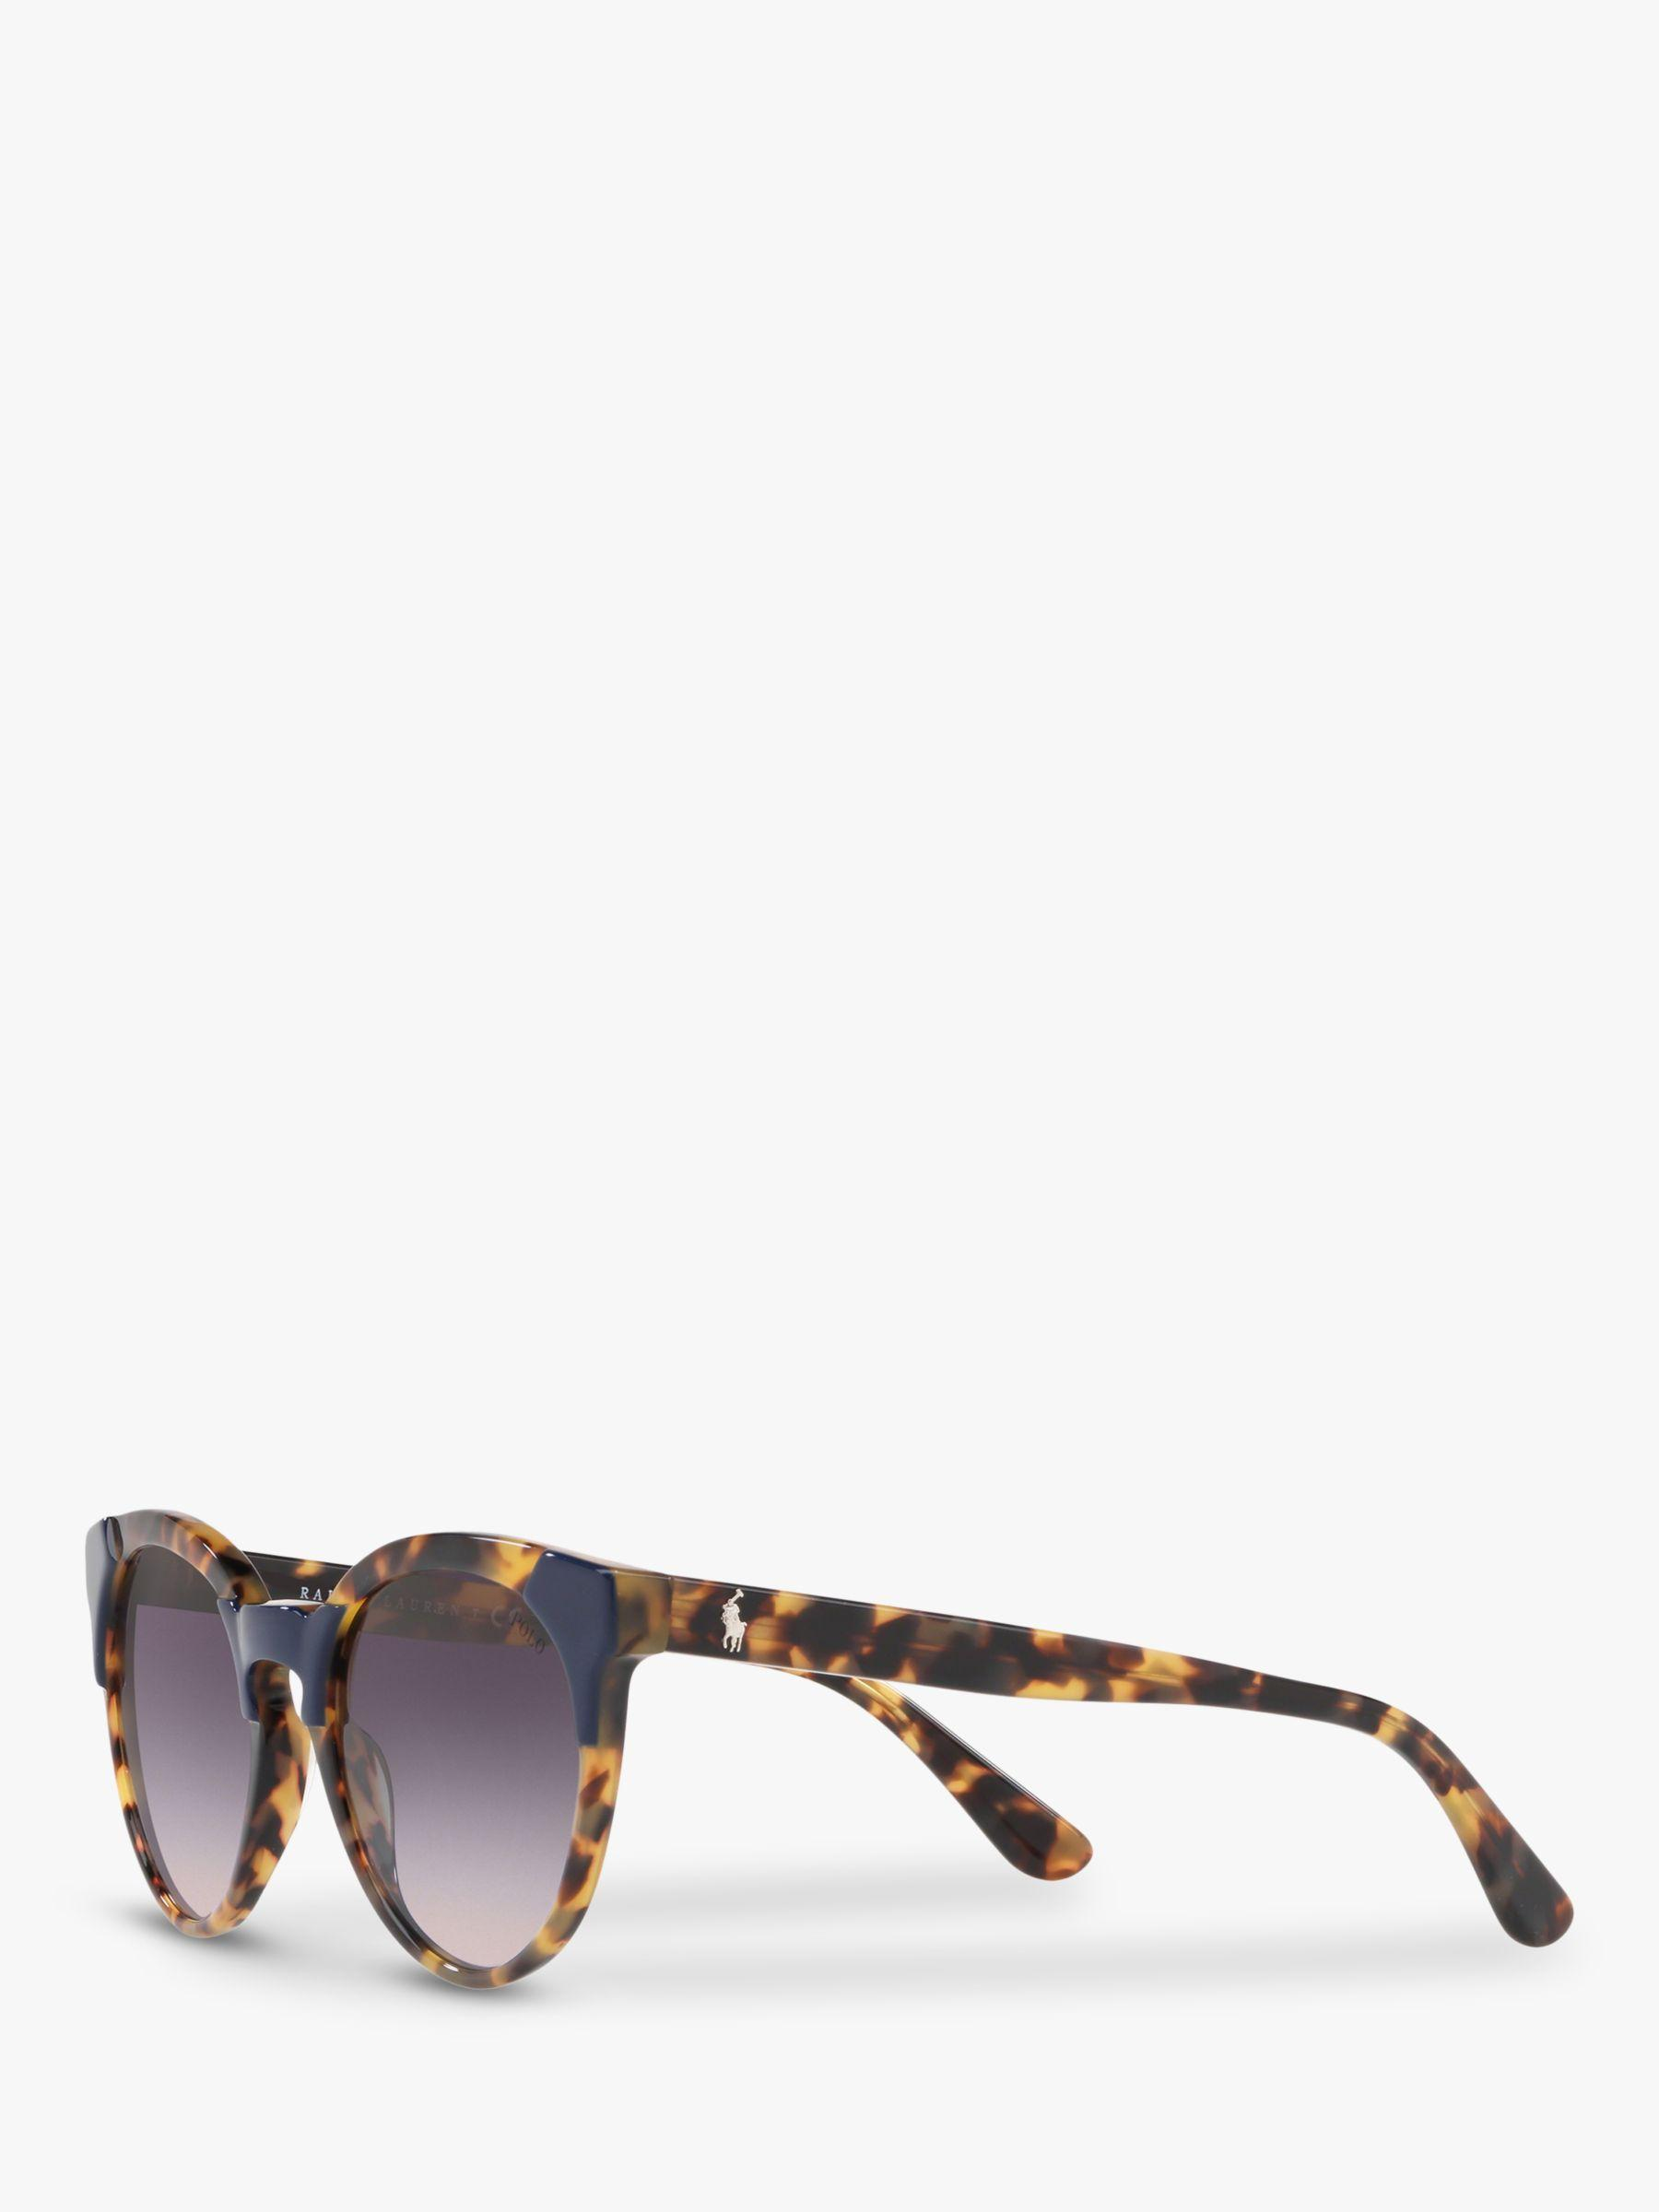 99e50b53a8 Ralph Lauren Polo Ph4147 Women s Phantos Sunglasses in Blue - Lyst